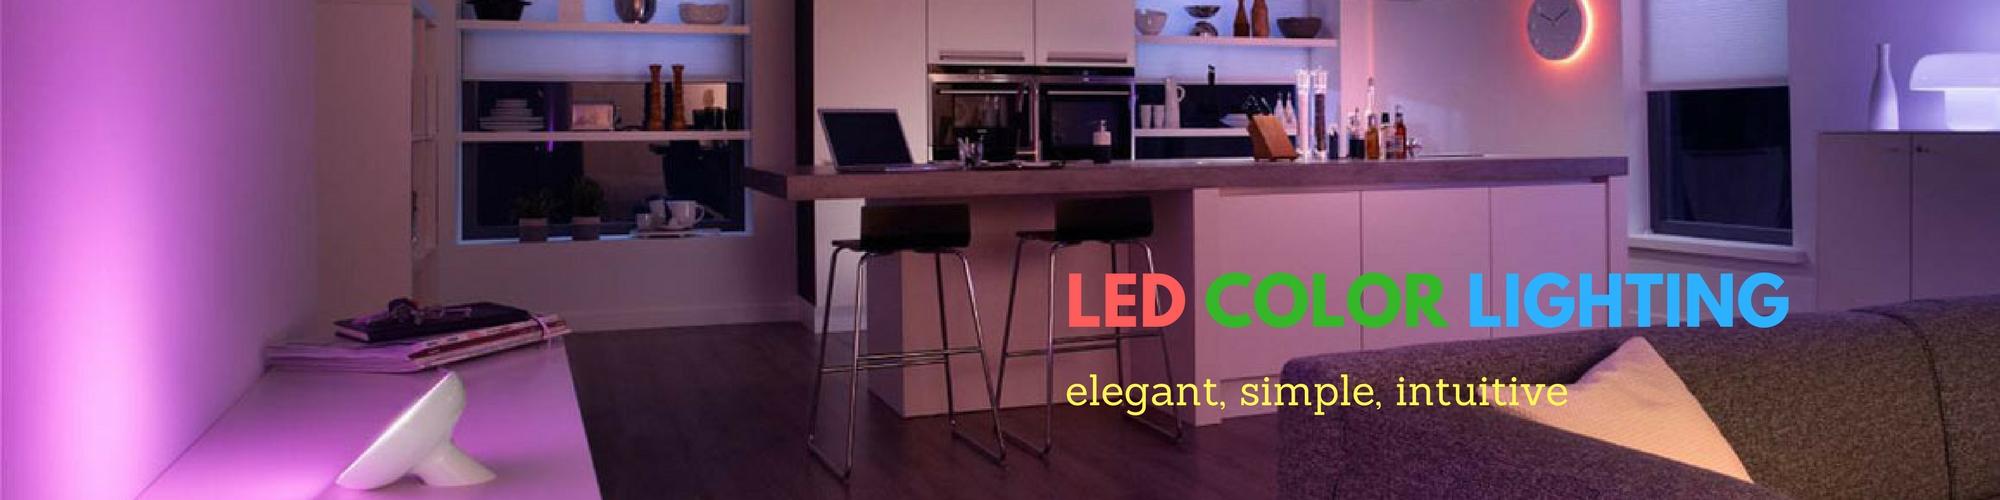 LED Color Lighting